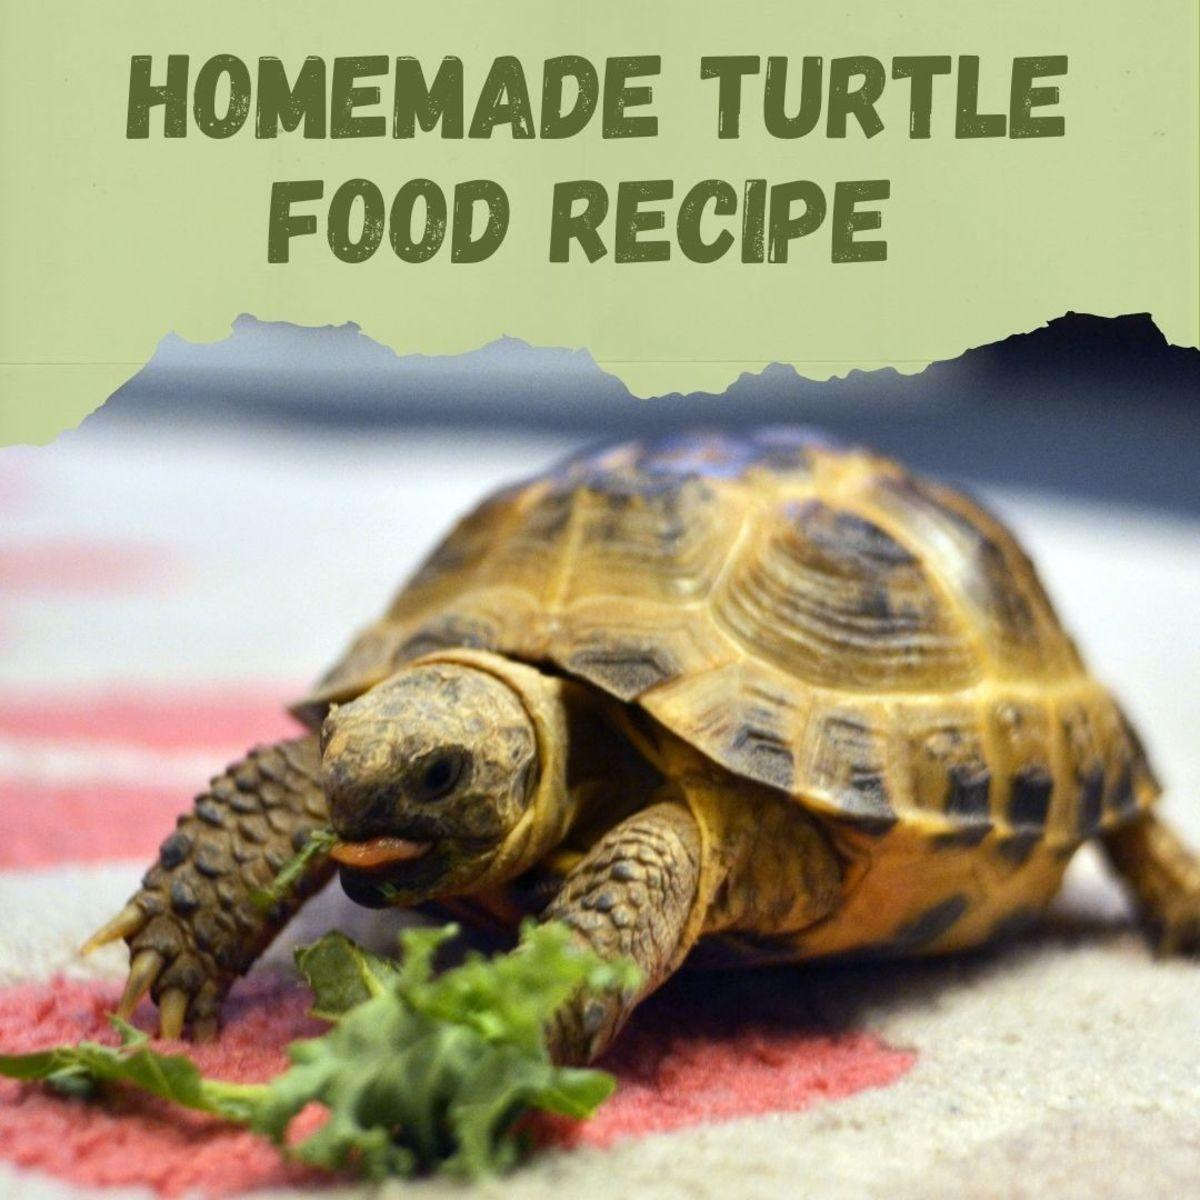 Homemade DIY turtle food recipe